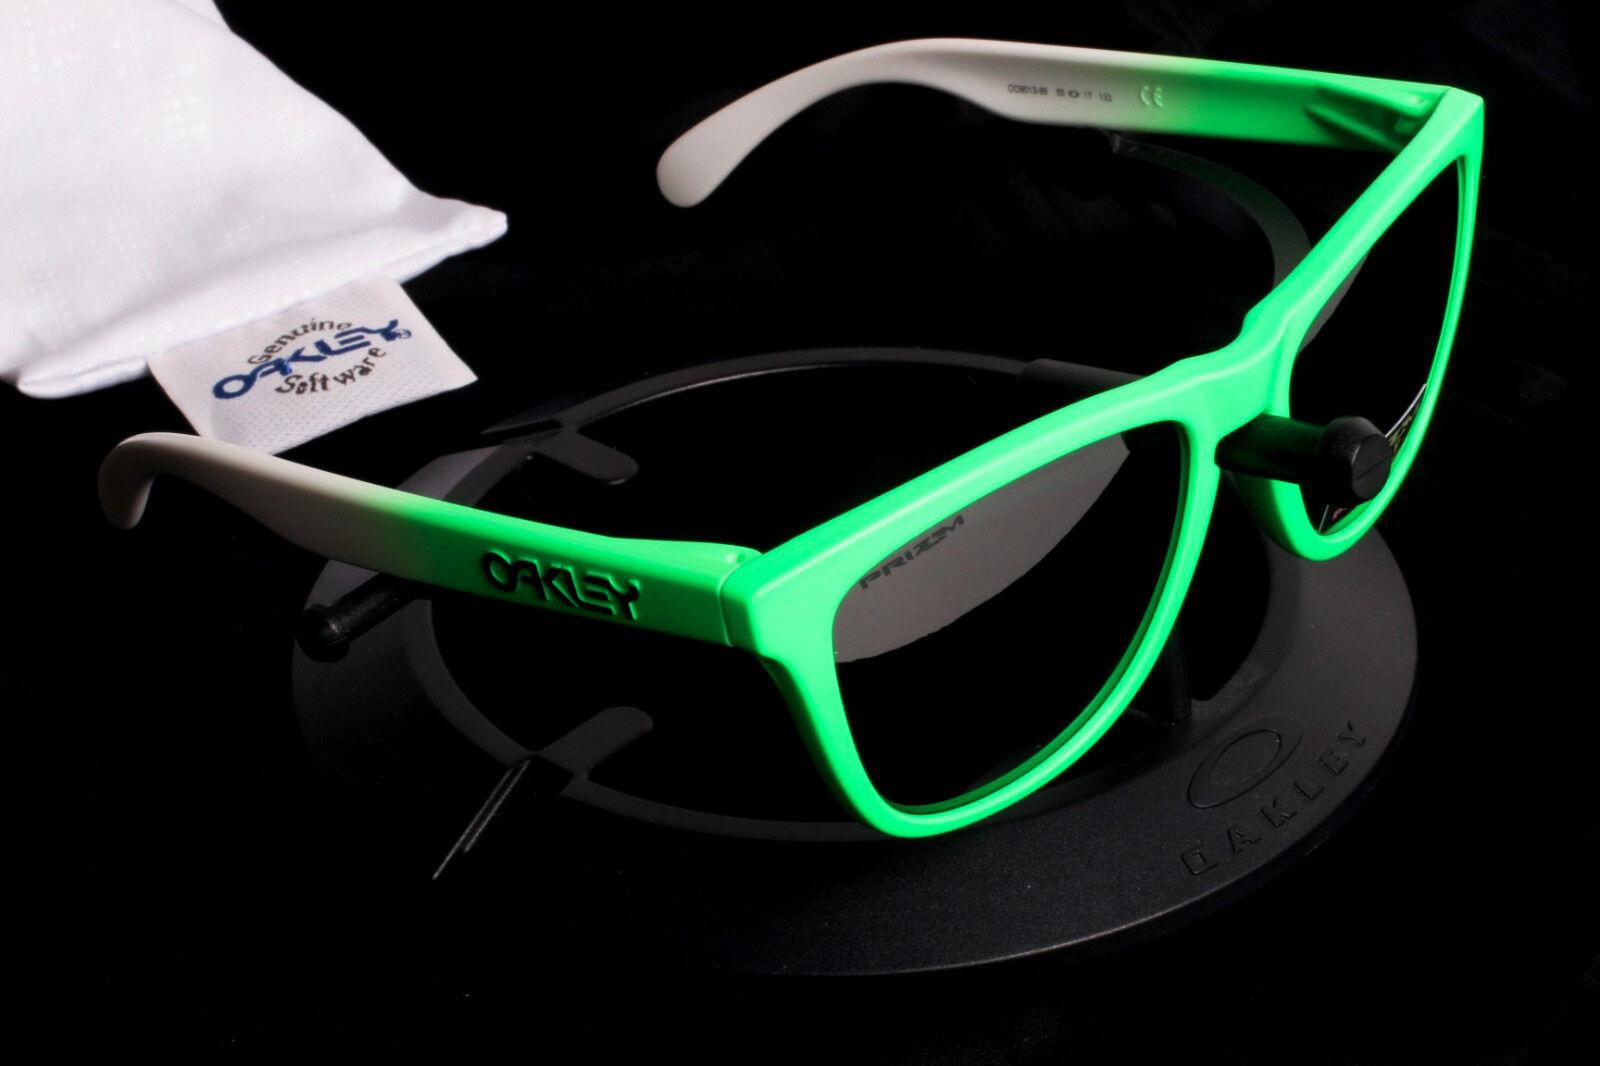 49efab5d10 Oakley Frogskins Neon Green   White Sunglasses Prizm Polarized Lenses -  9013-99 아이템 넘버  283003585500.